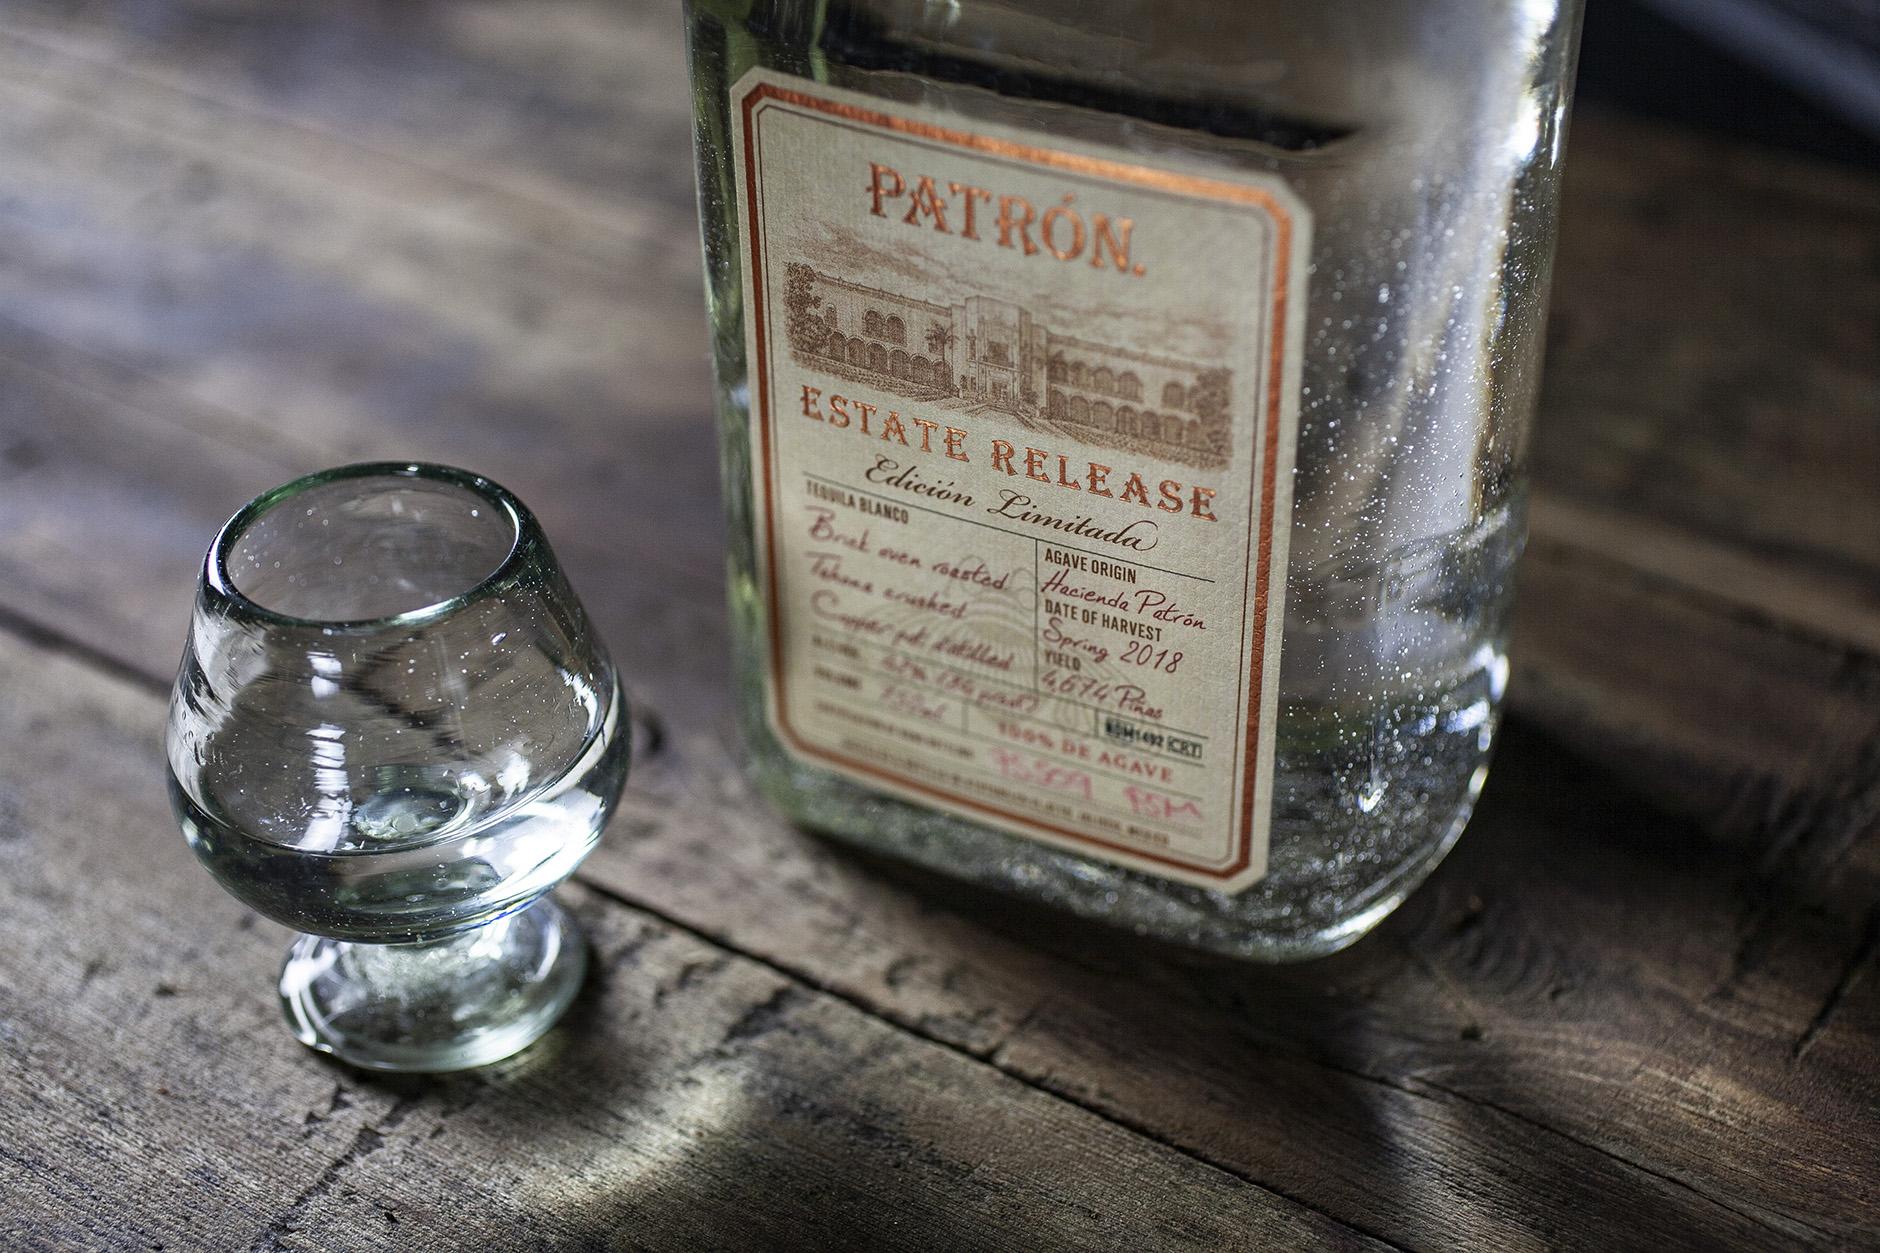 patron estate release tequila